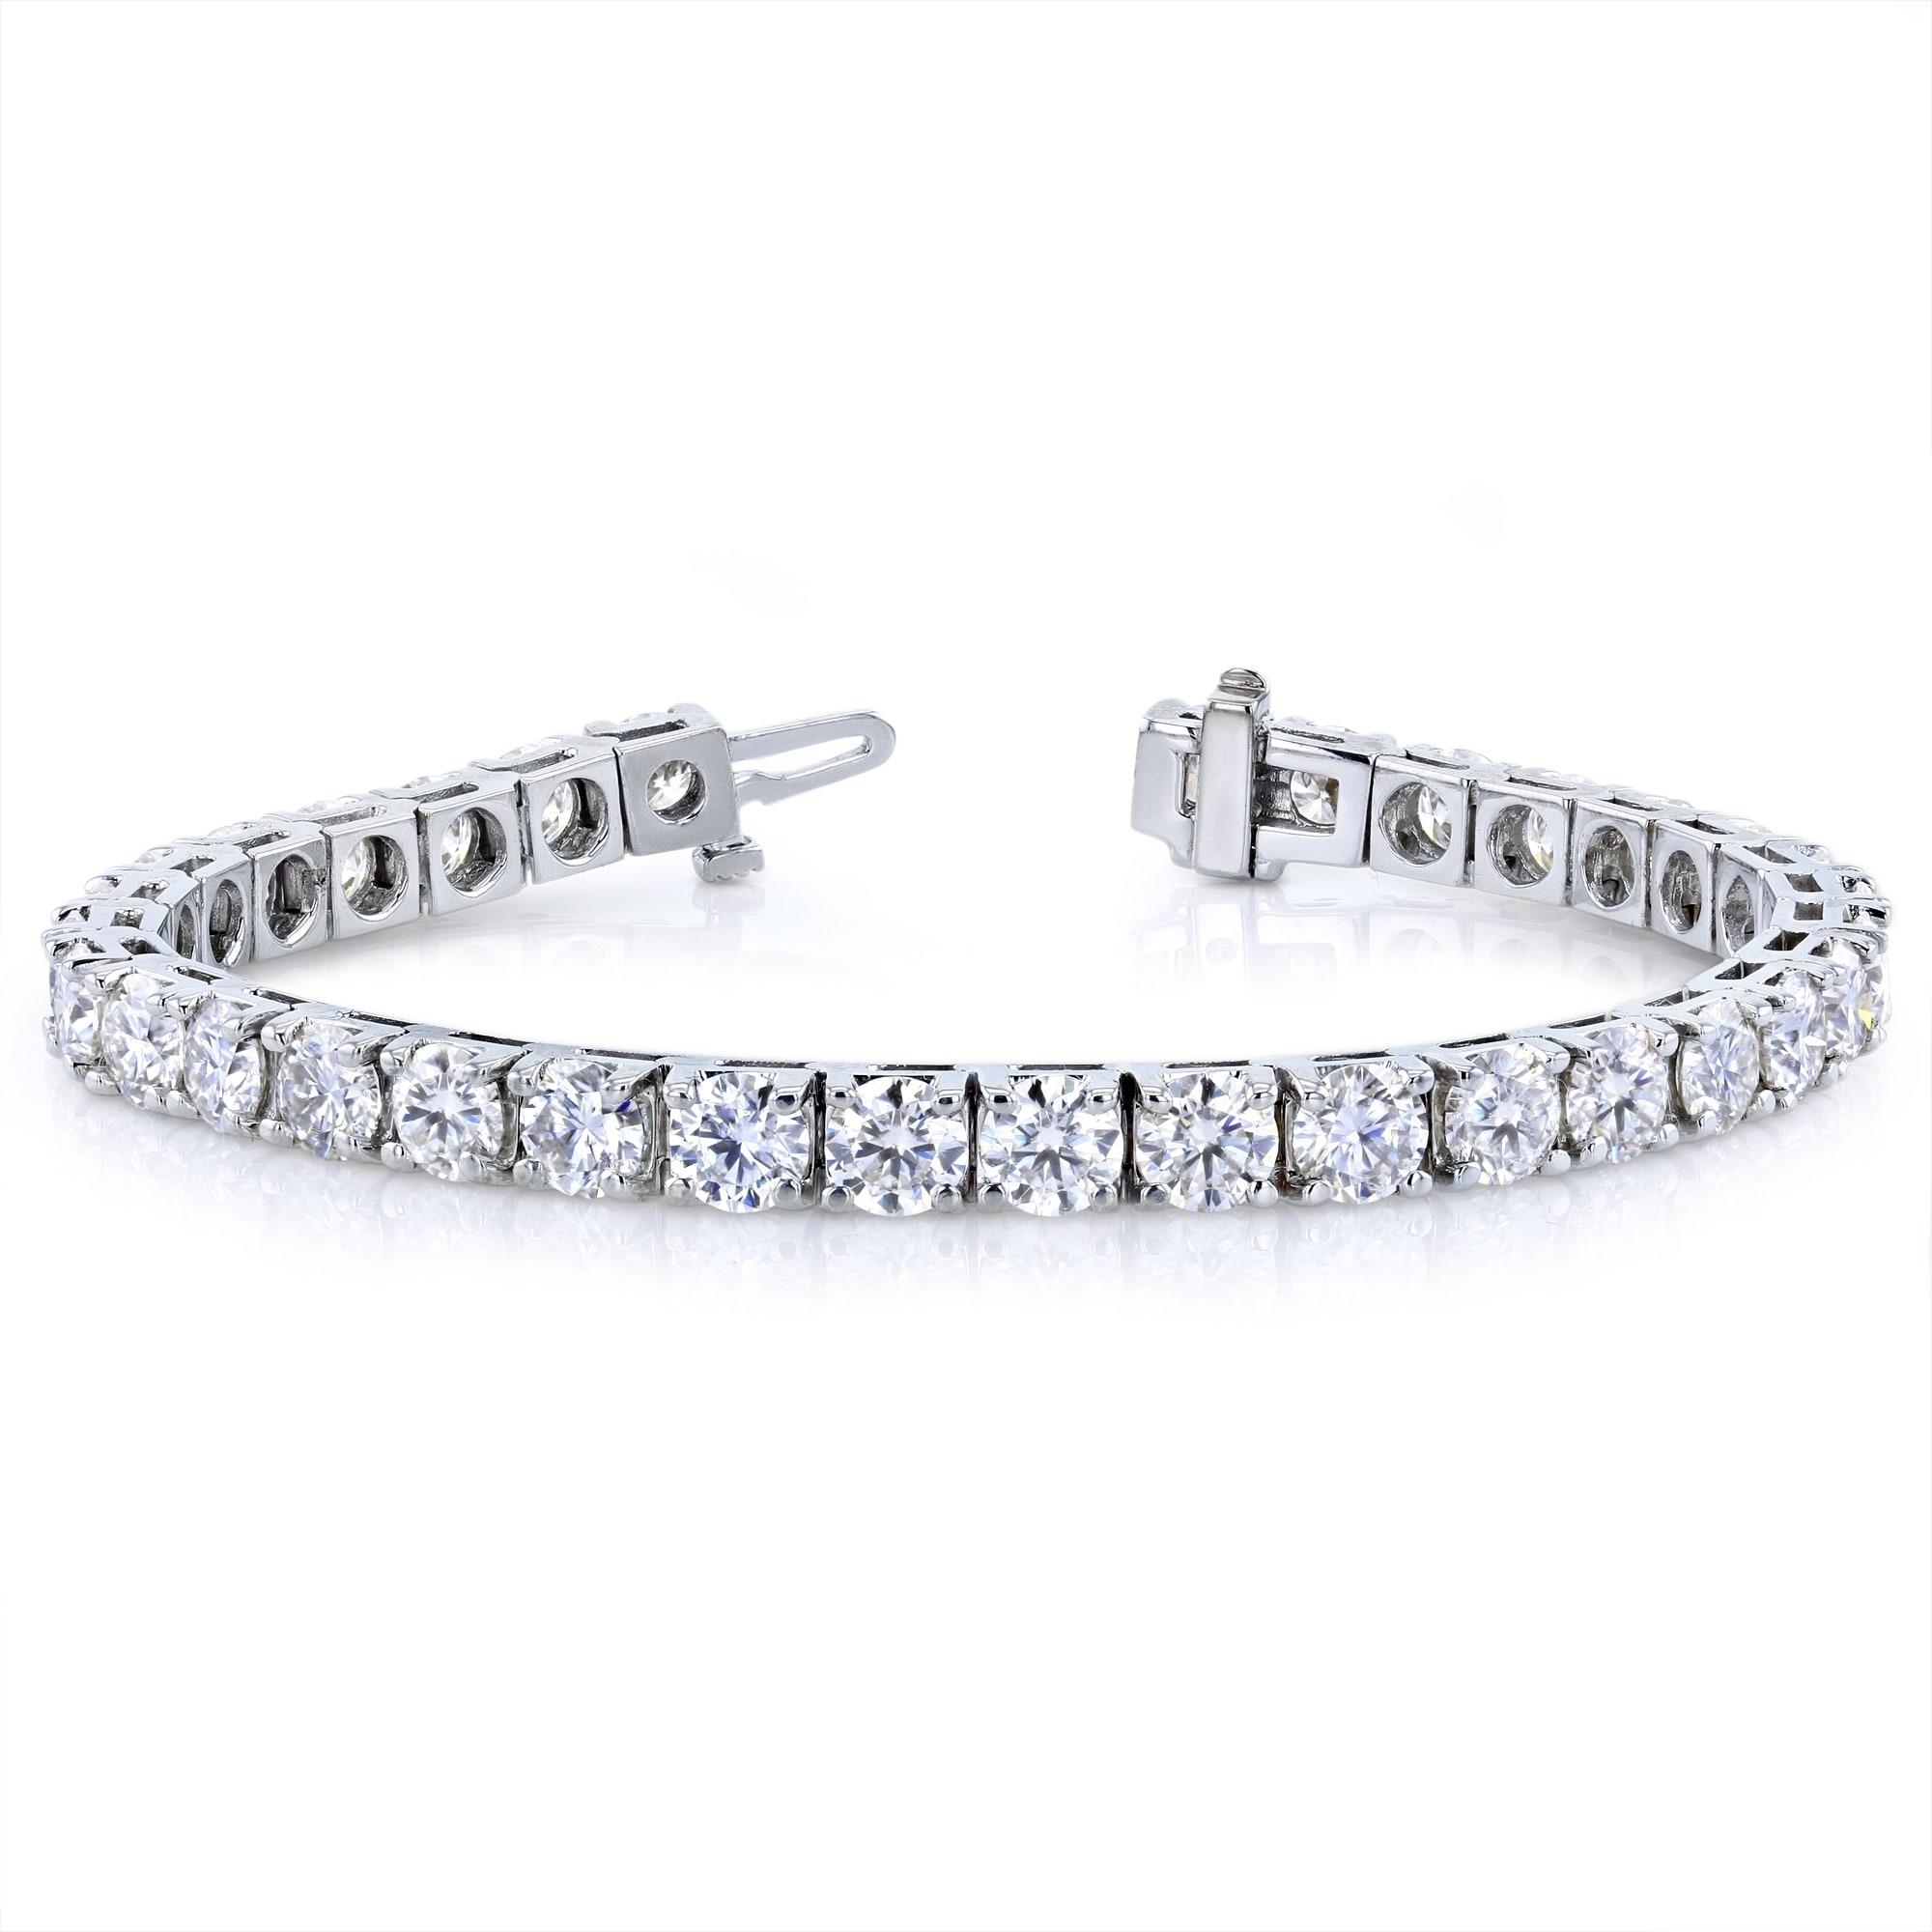 Annello By Kobelli 10k White Gold 16 1 2 Carats Tgw Moissanite Tennis Bracelet Hi Vs On Free Shipping Today 8611905